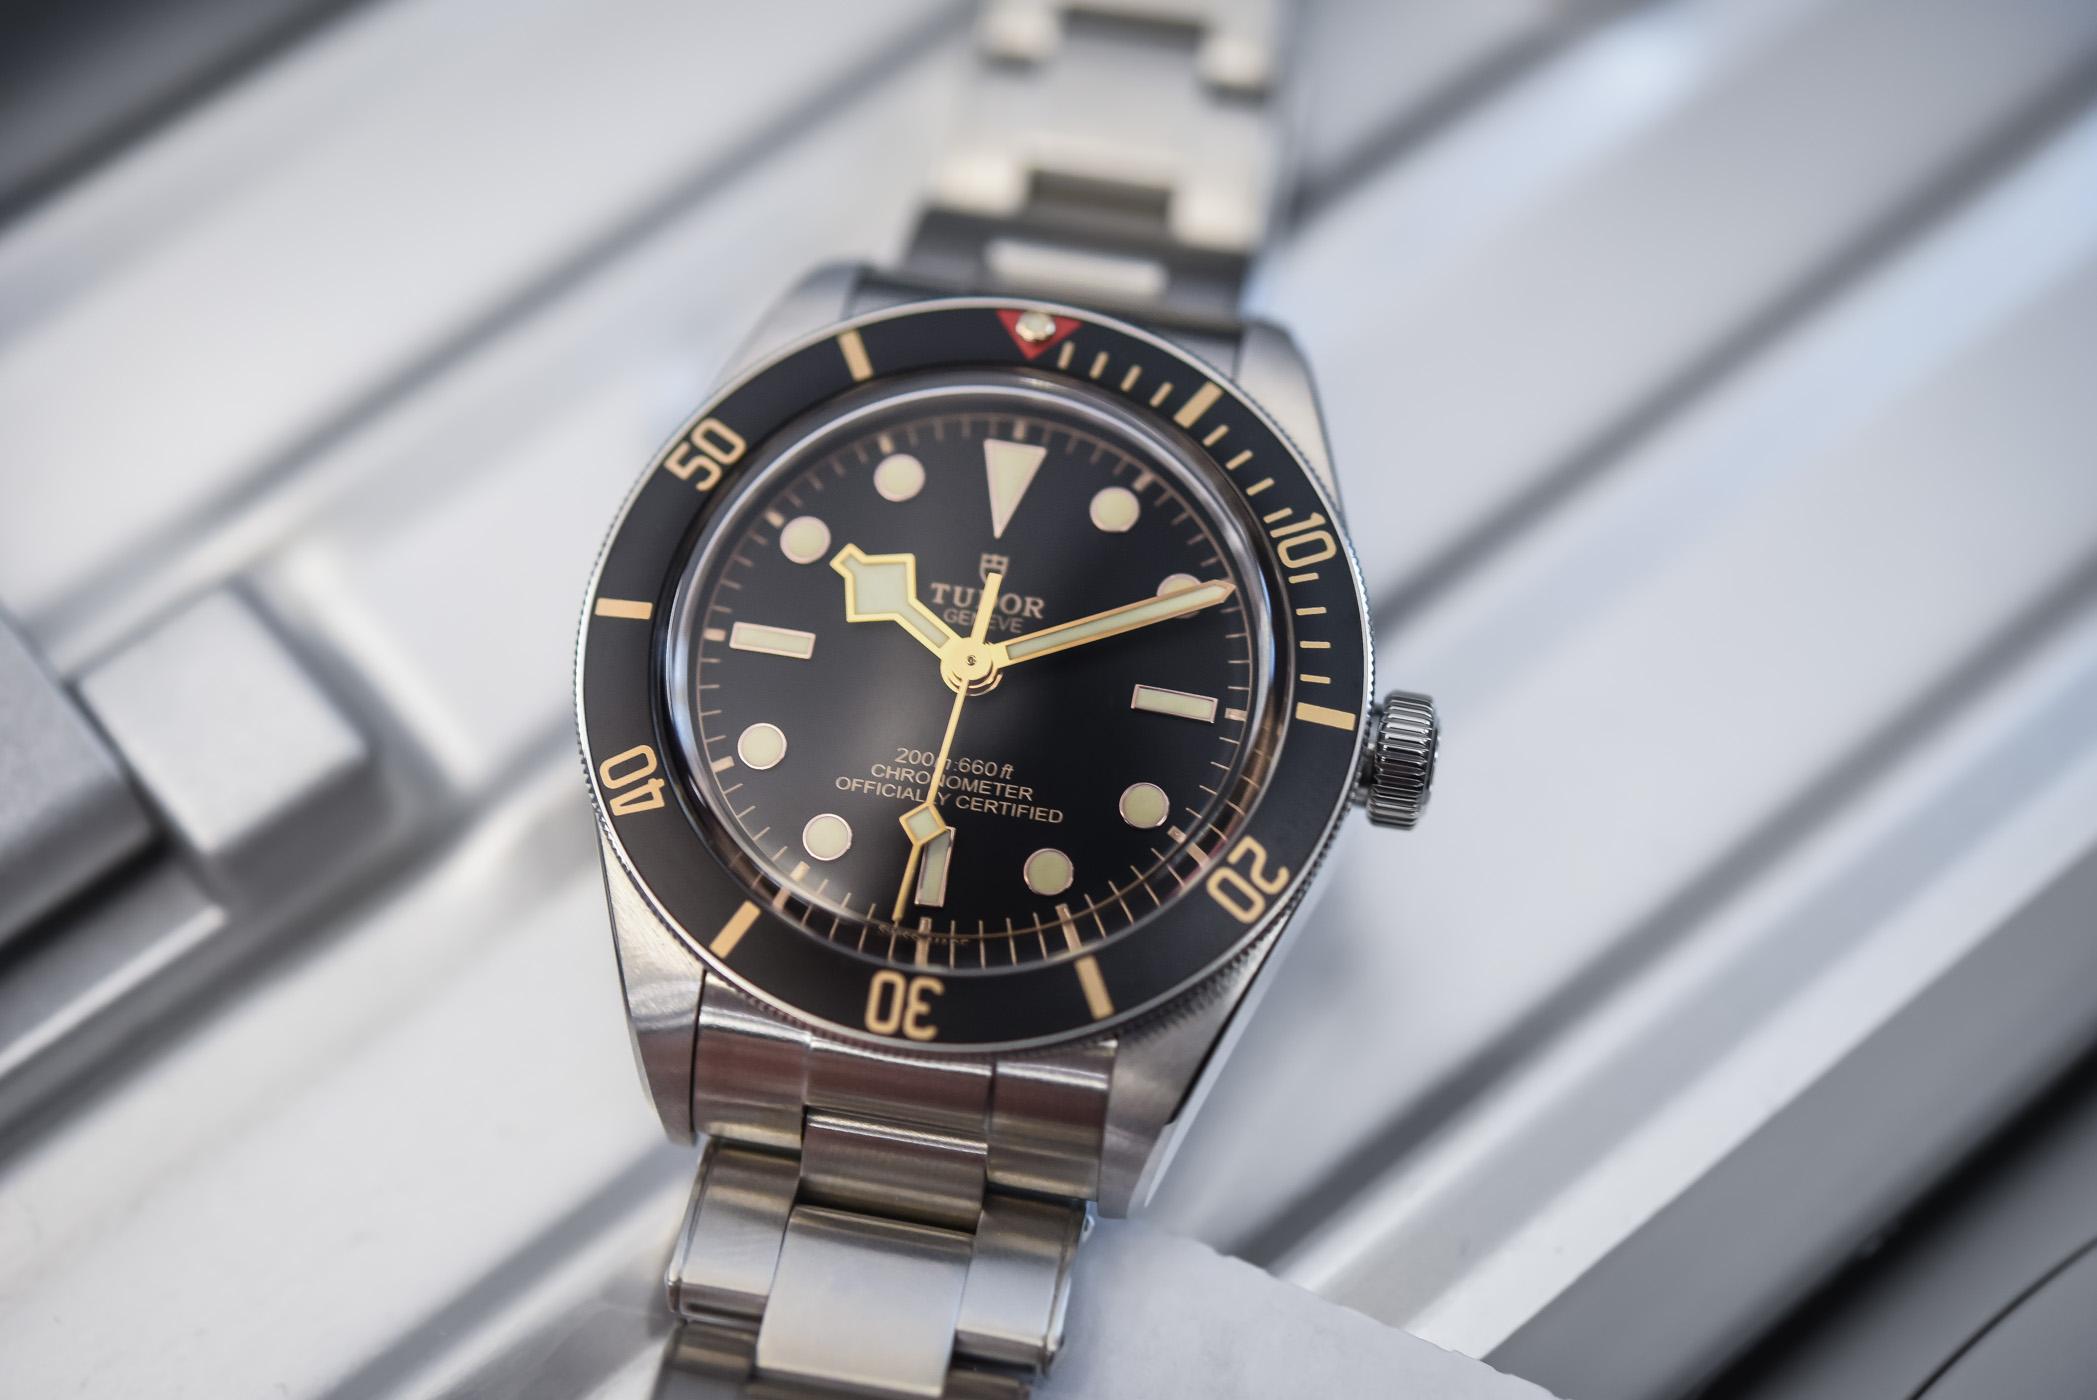 f61cd222ce1 Hands-On - Tudor Black Bay Fifty-Eight 39mm 79030N - Baselworld 2018 ...